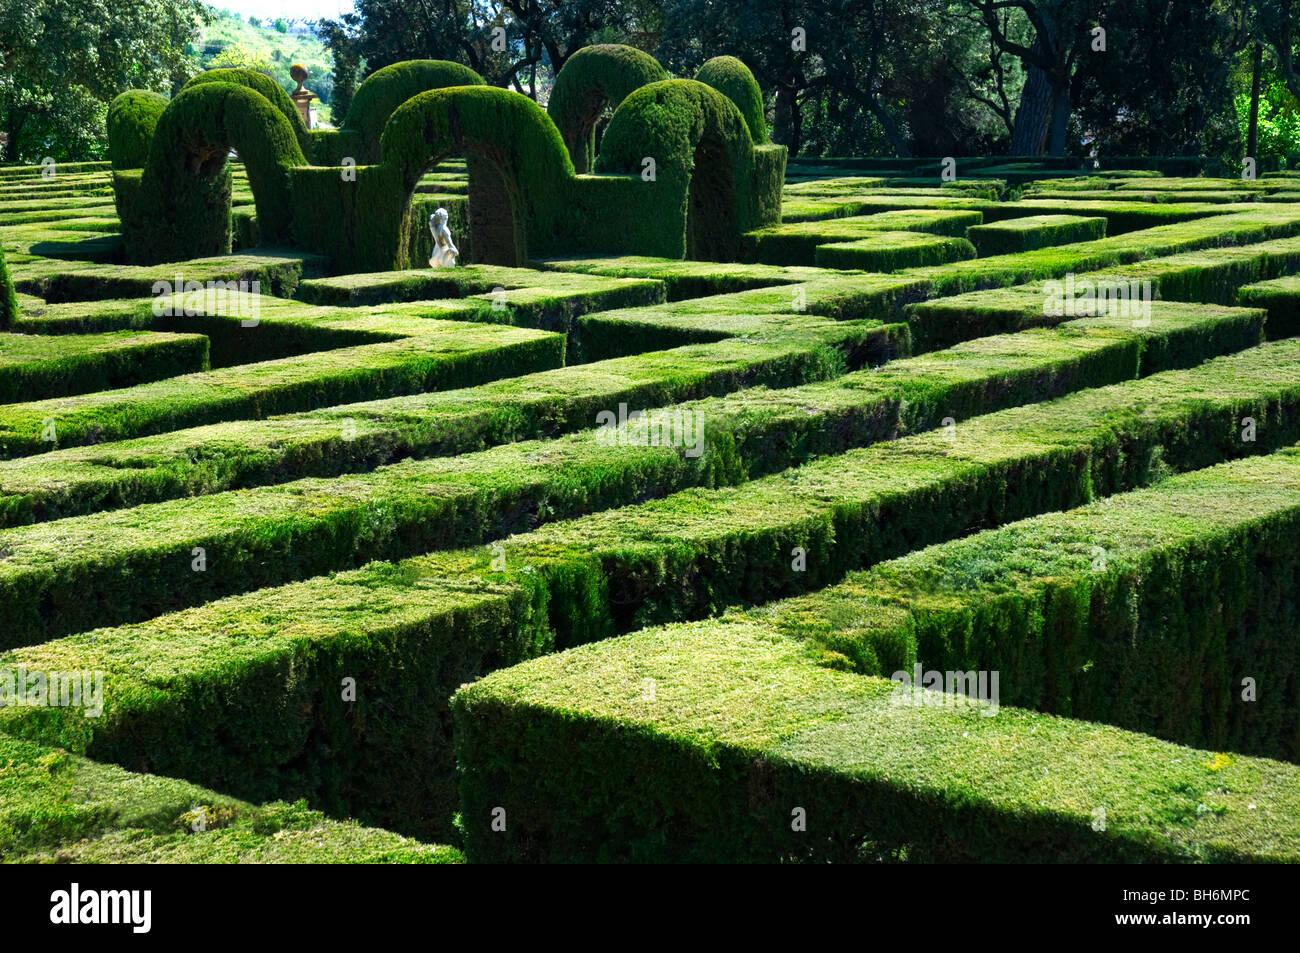 Parc del Laberint d' Horta . Barcelona.Catalonia.Spain. - Stock Image